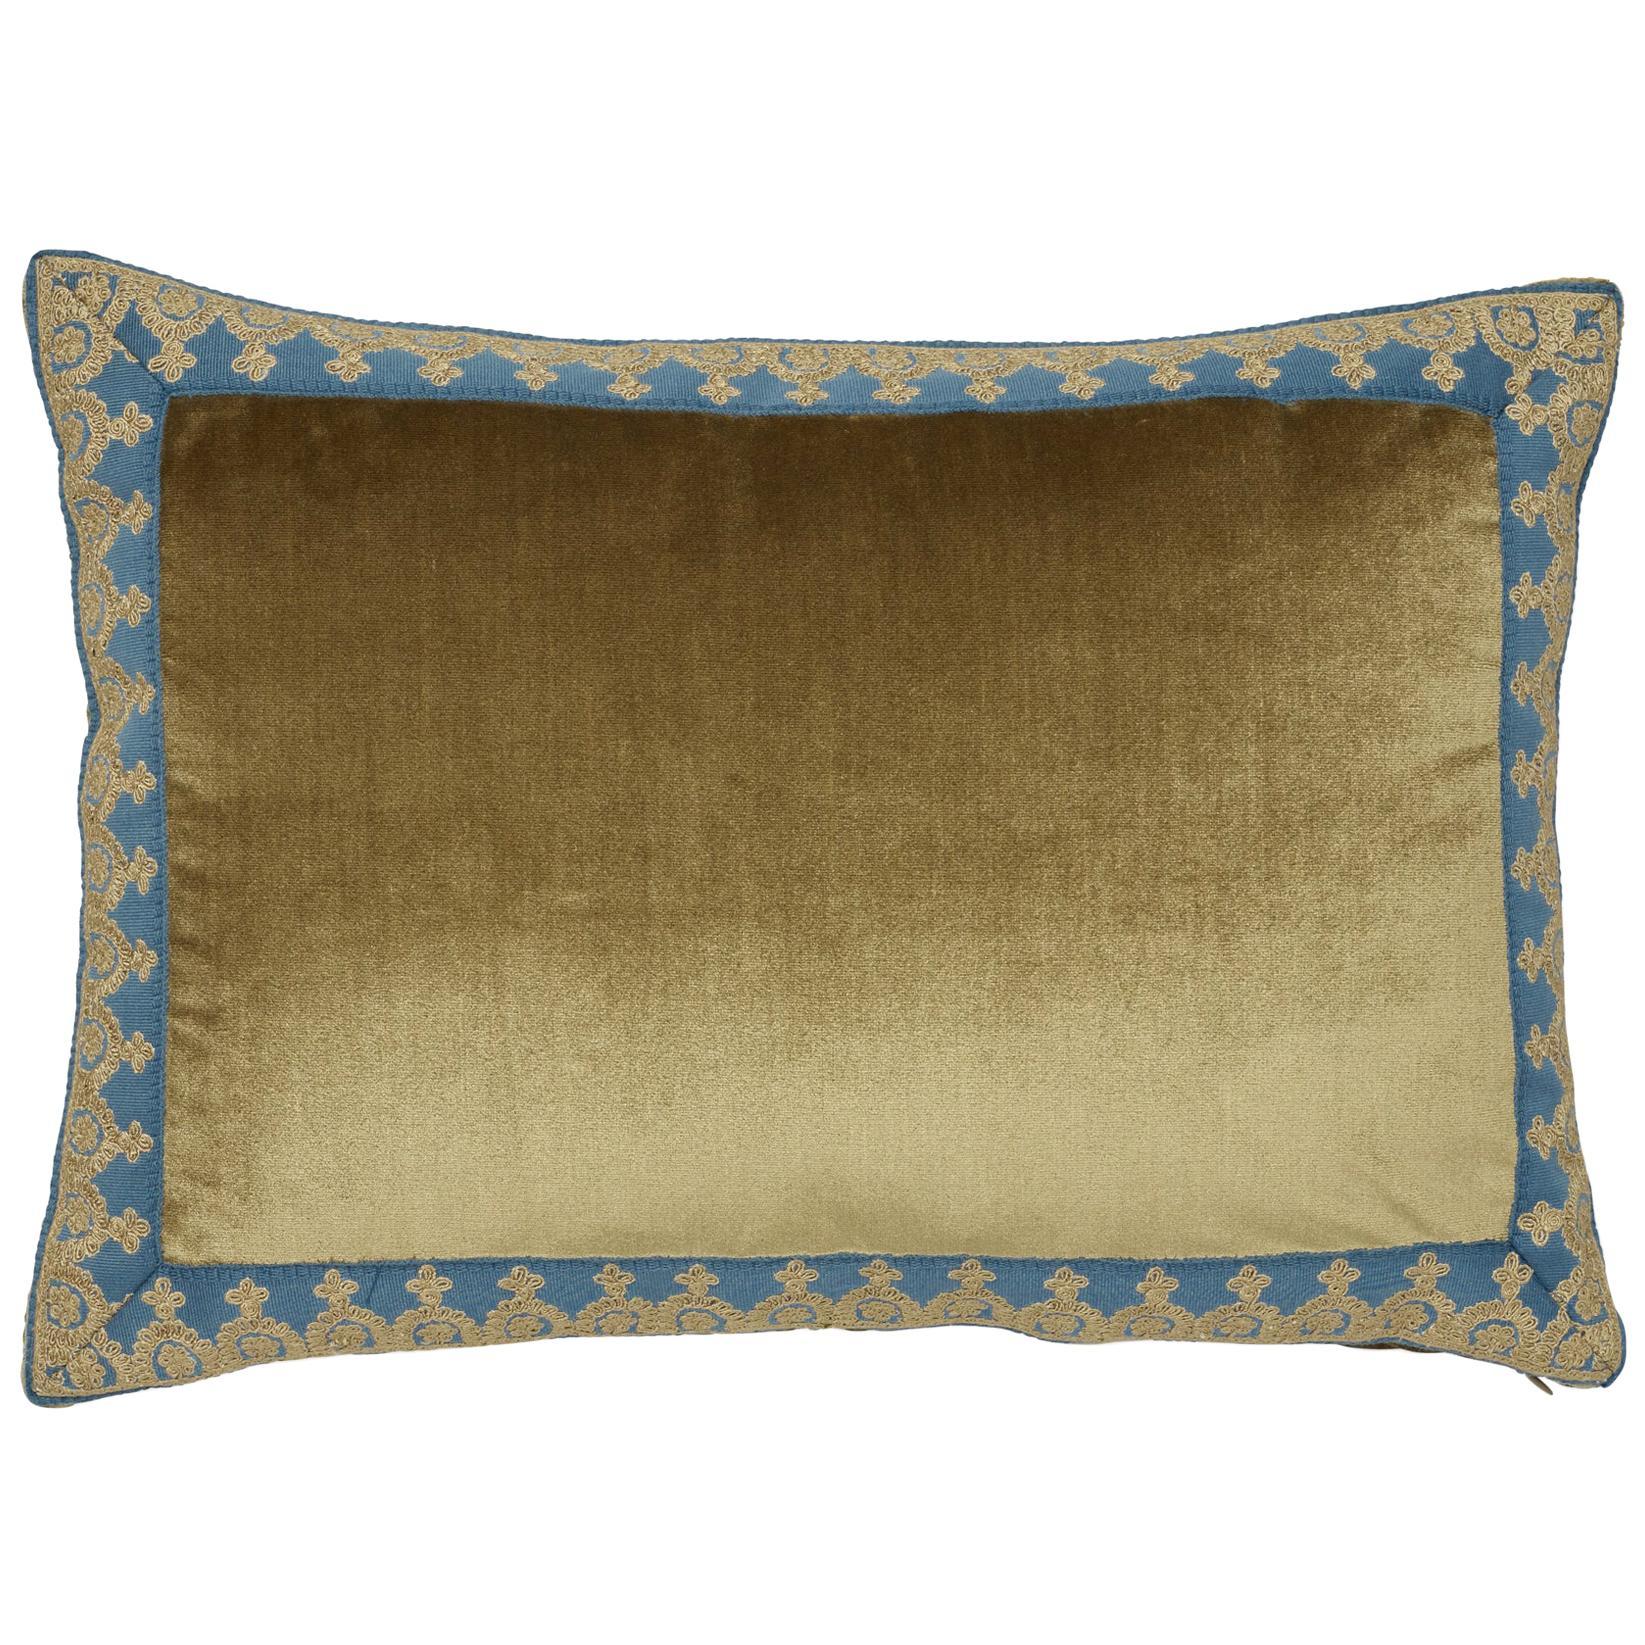 Lumbar pillow, Blue velvet, Lumbar